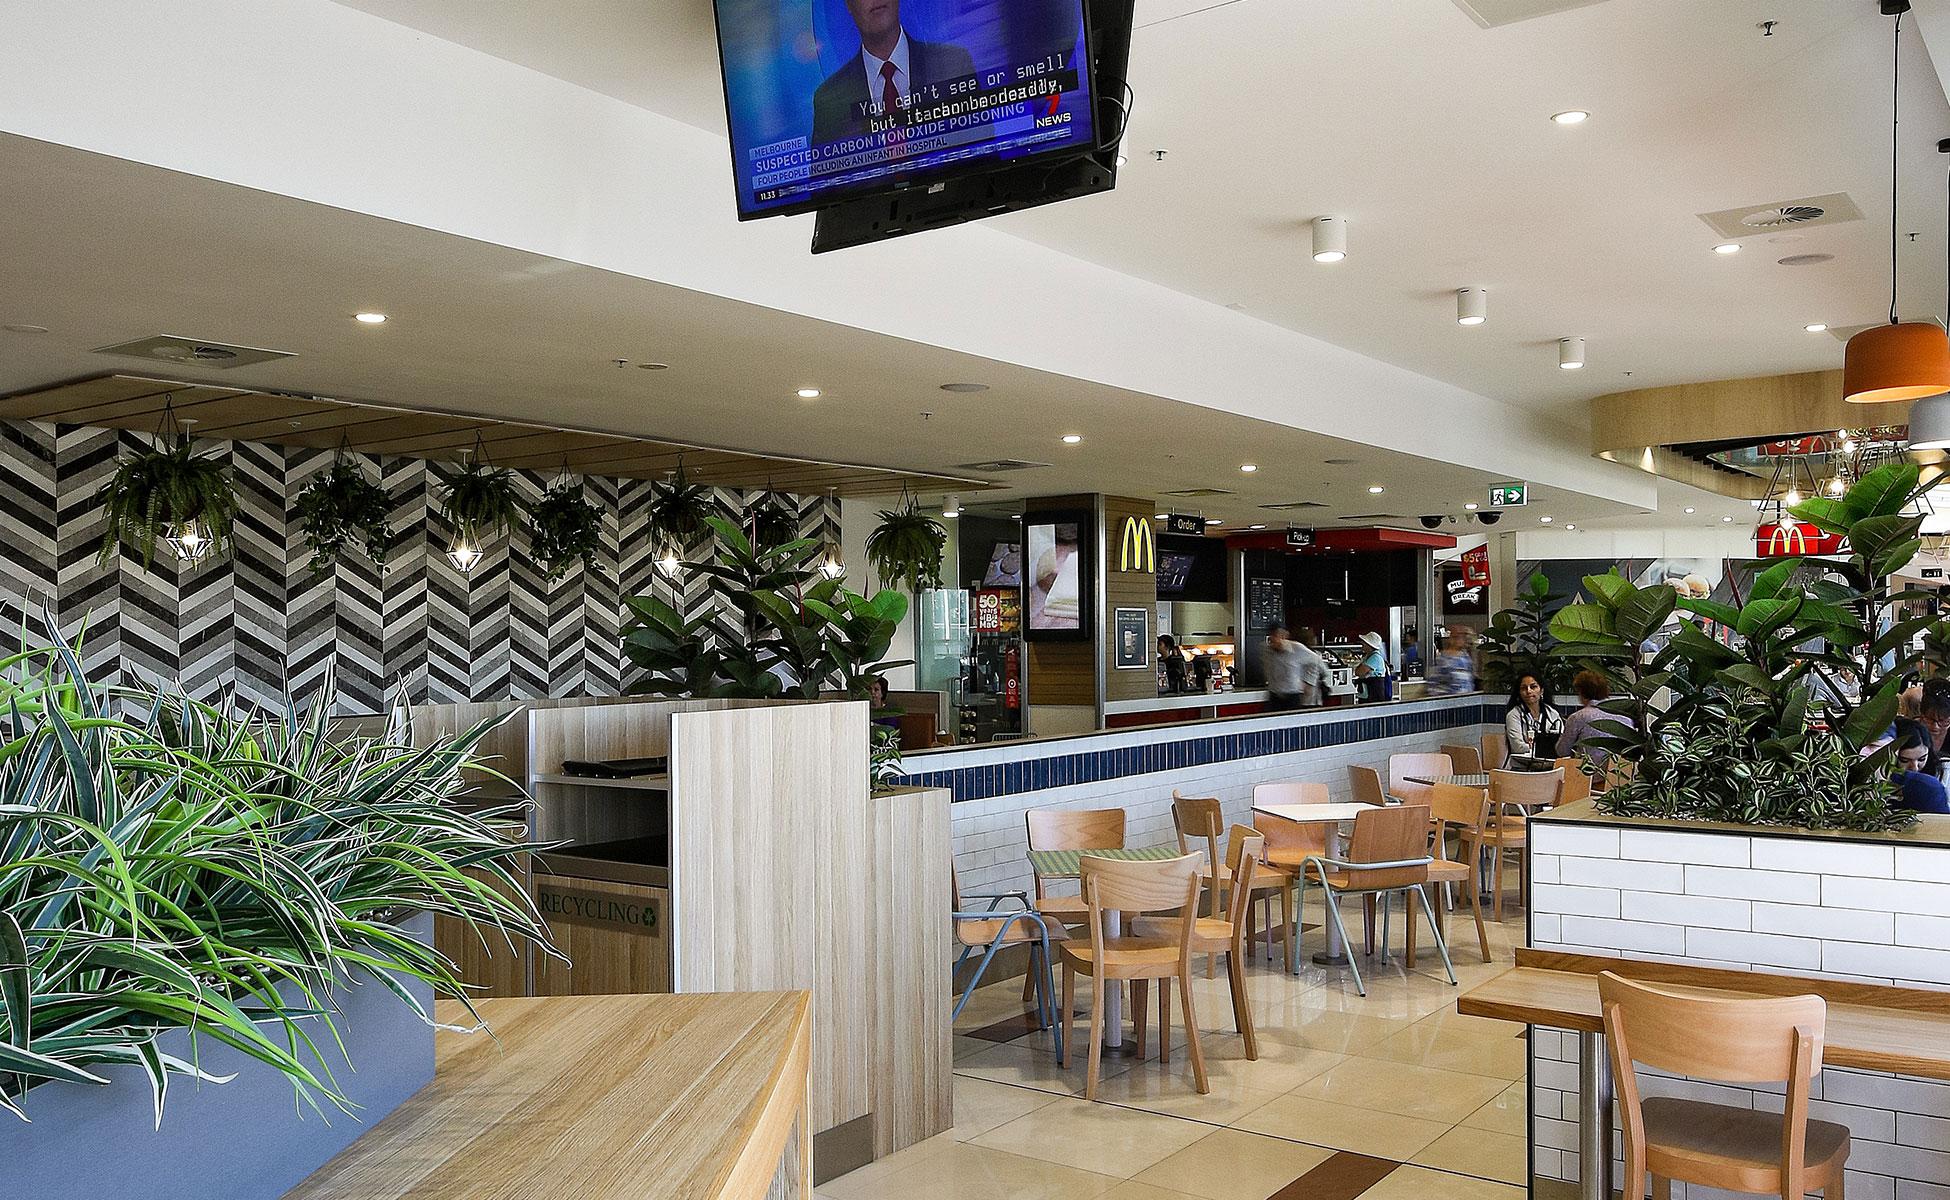 Australia Fair Food Court